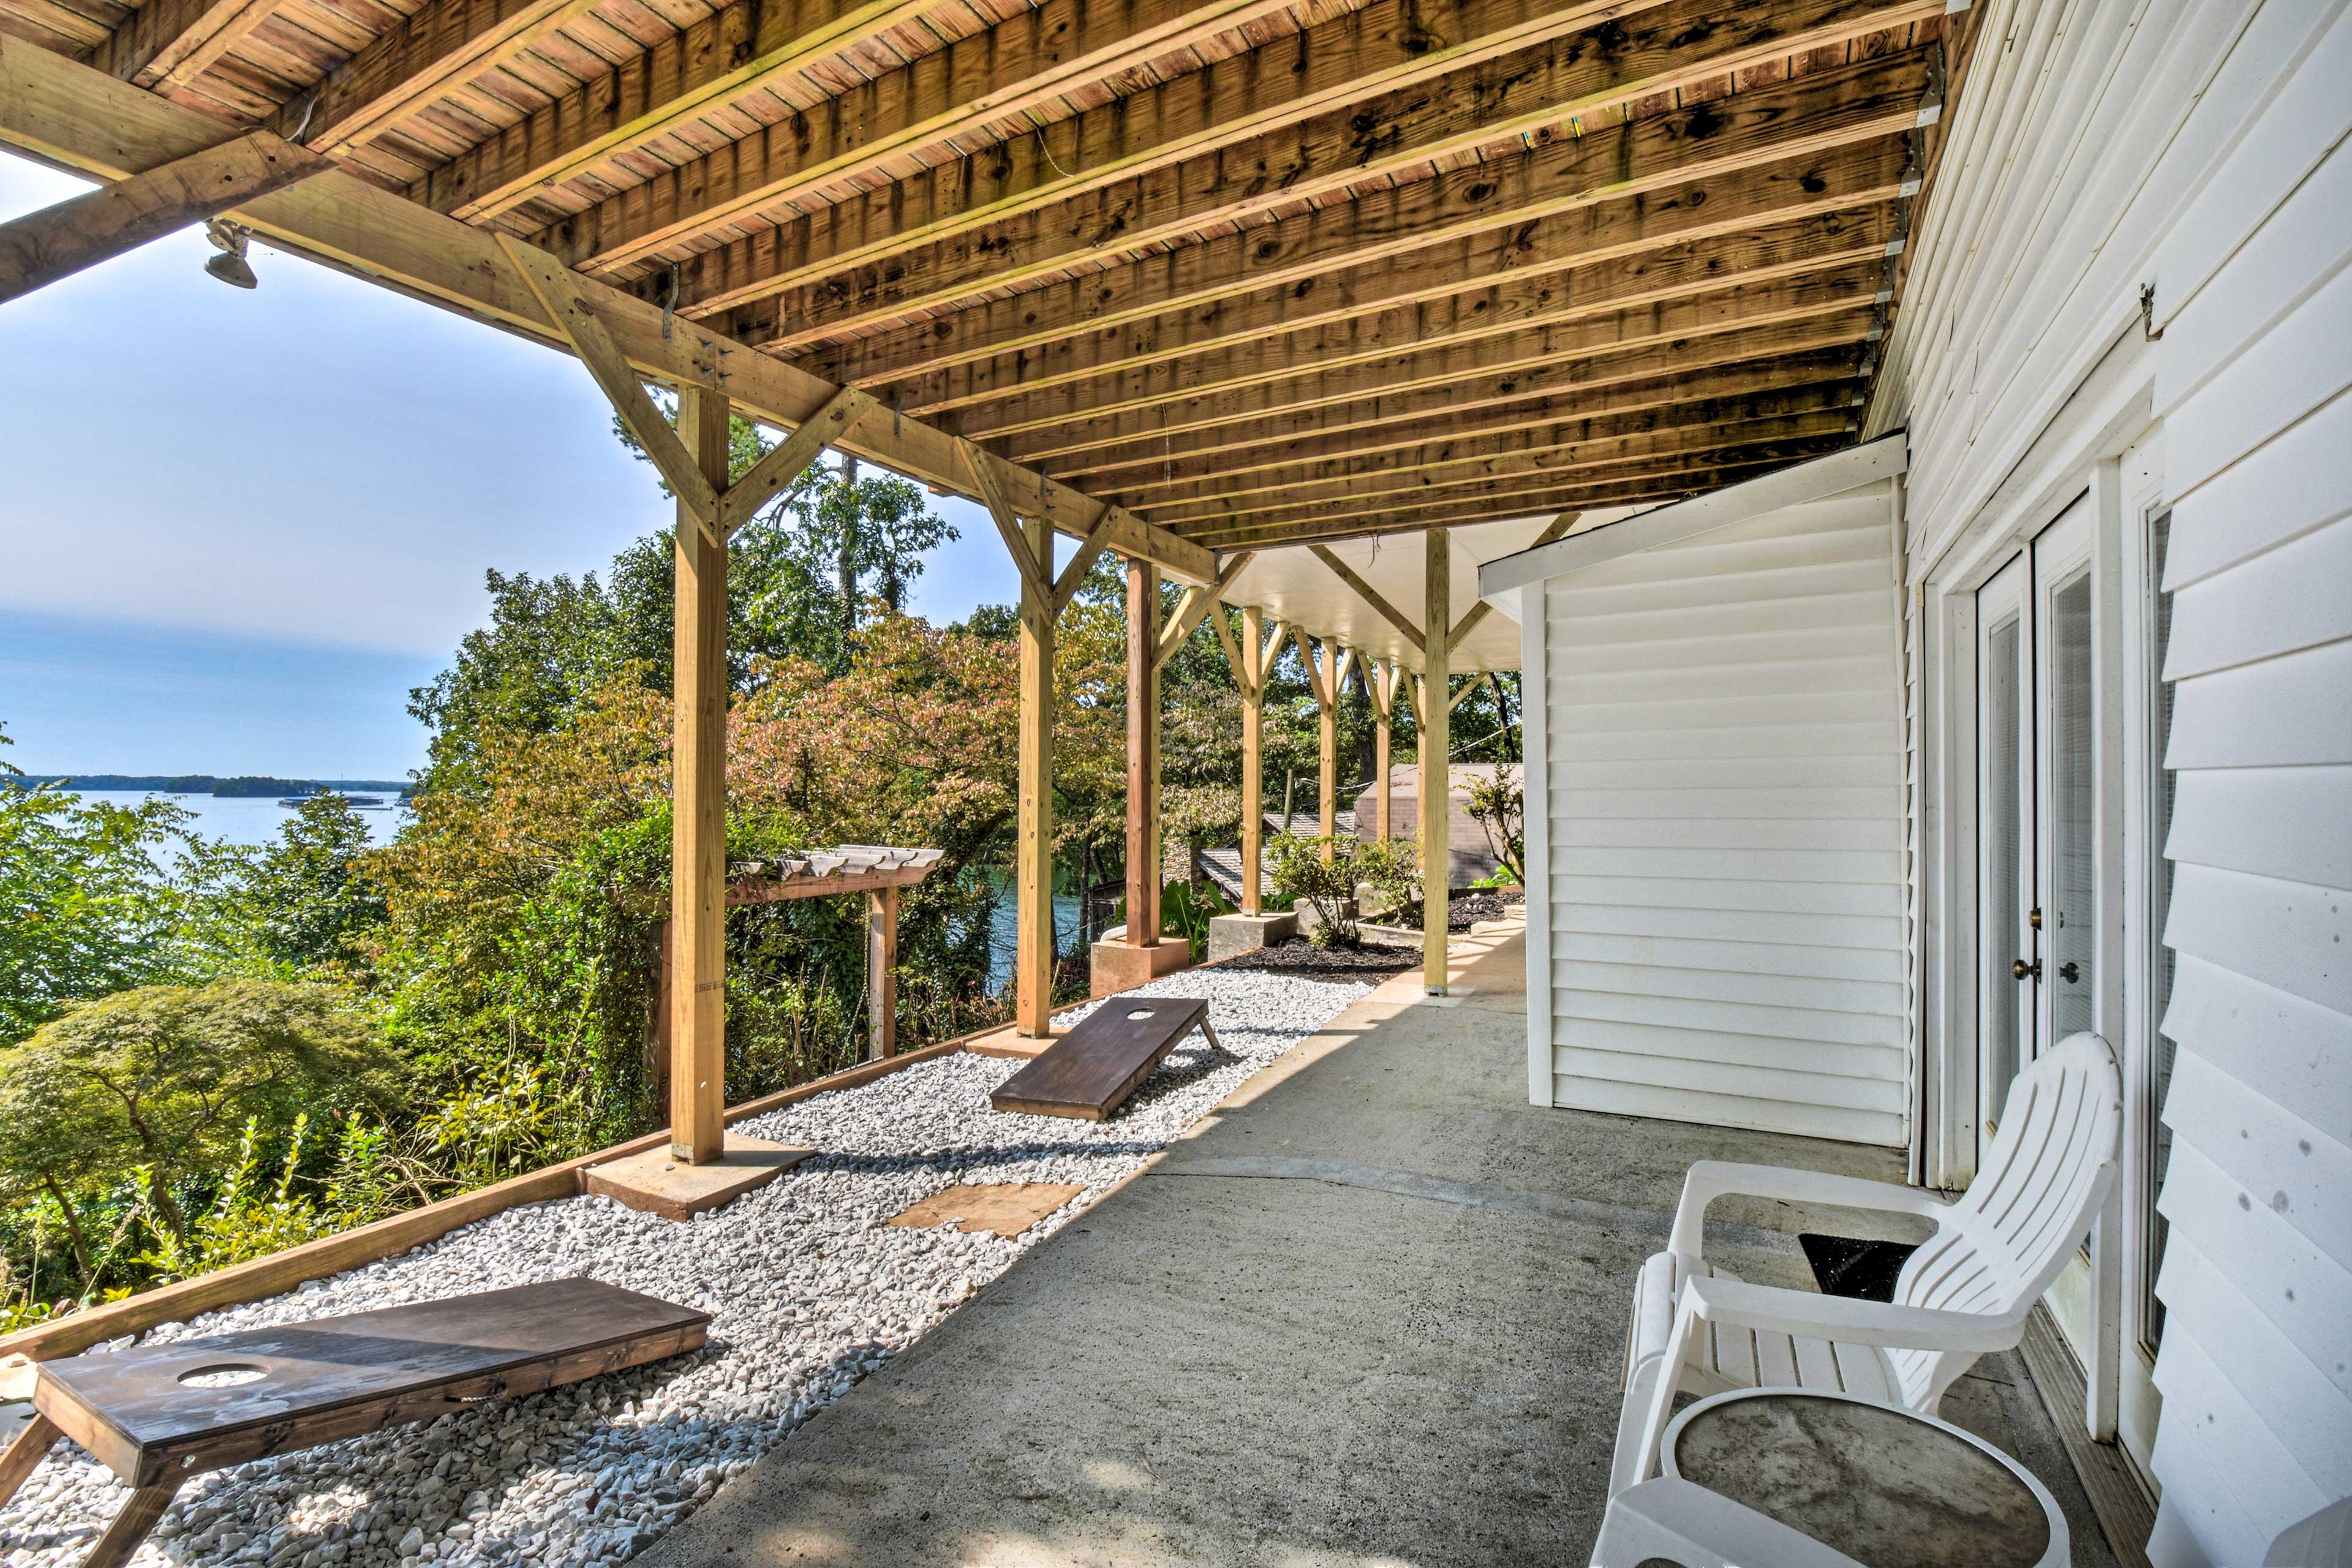 Property Exterior | Covered Patio | Cornhole